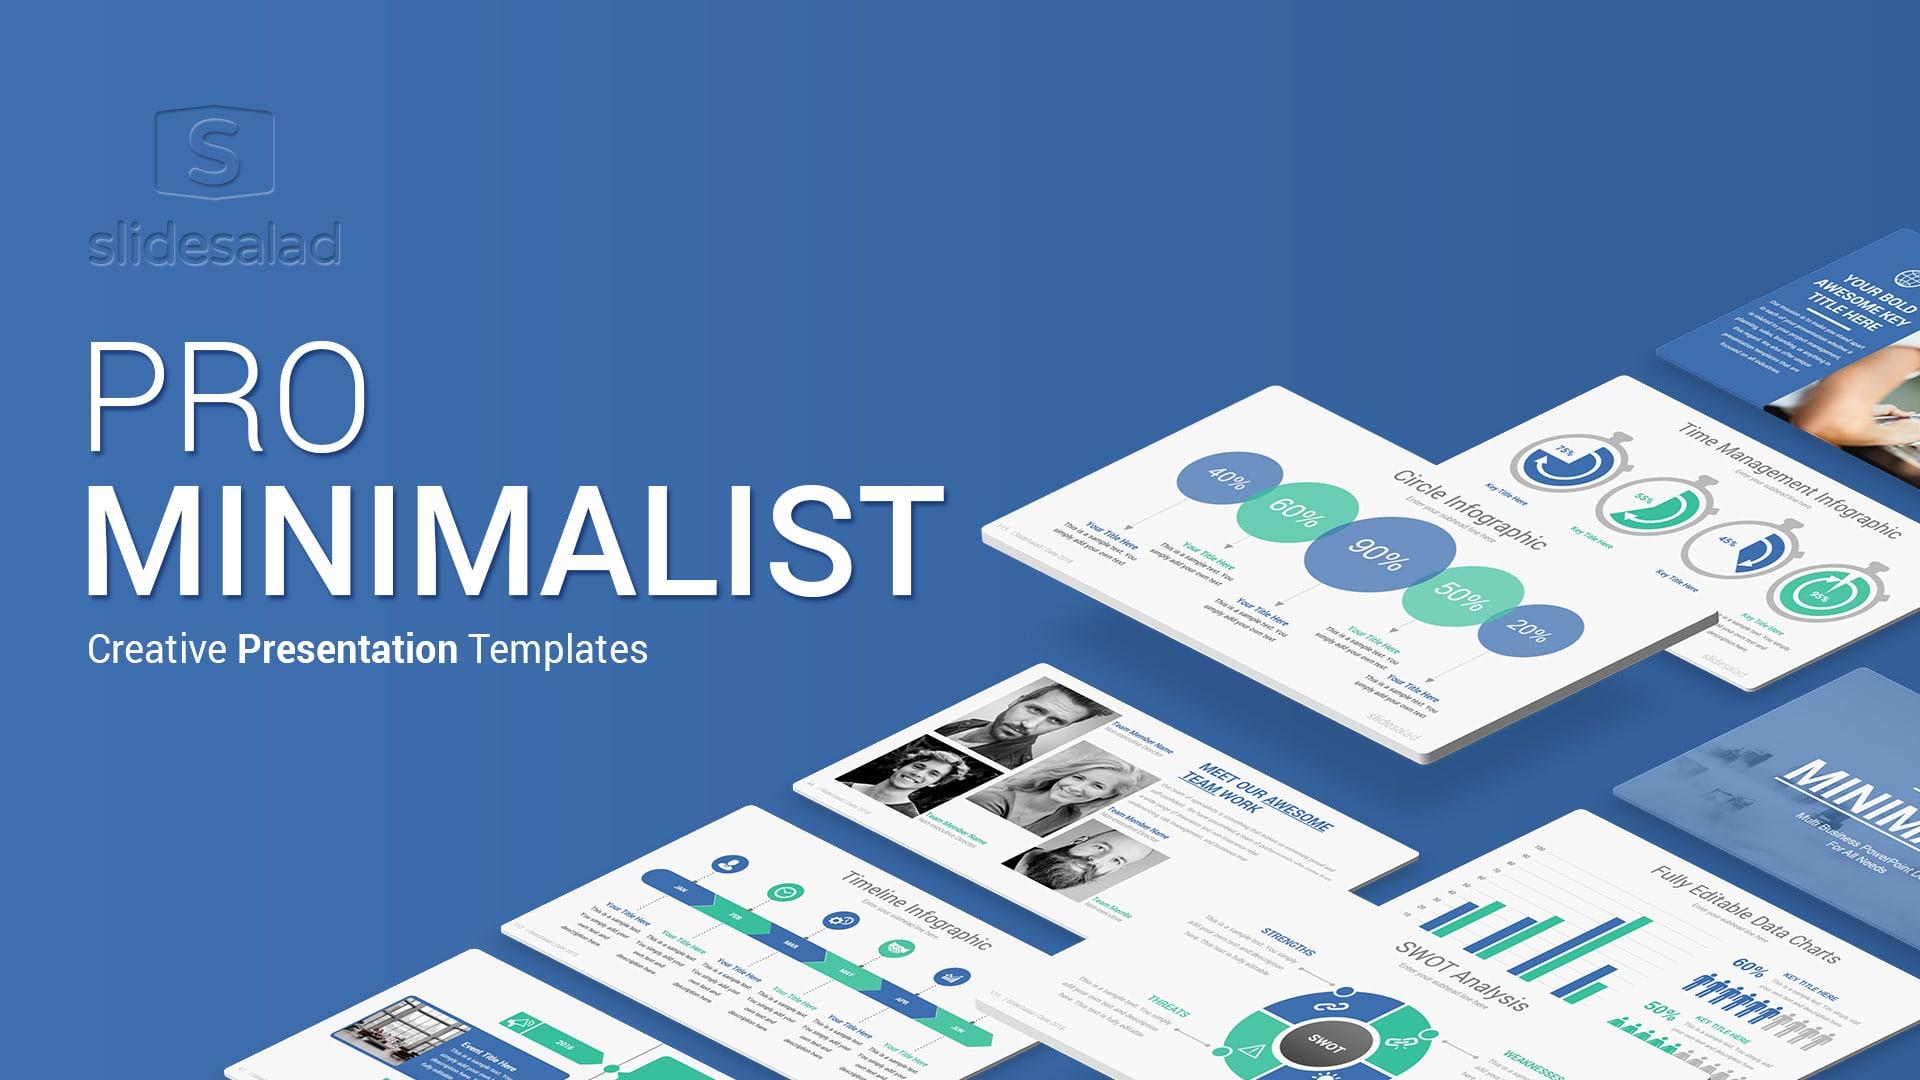 Pro Minimalist Presentation Templates Designs